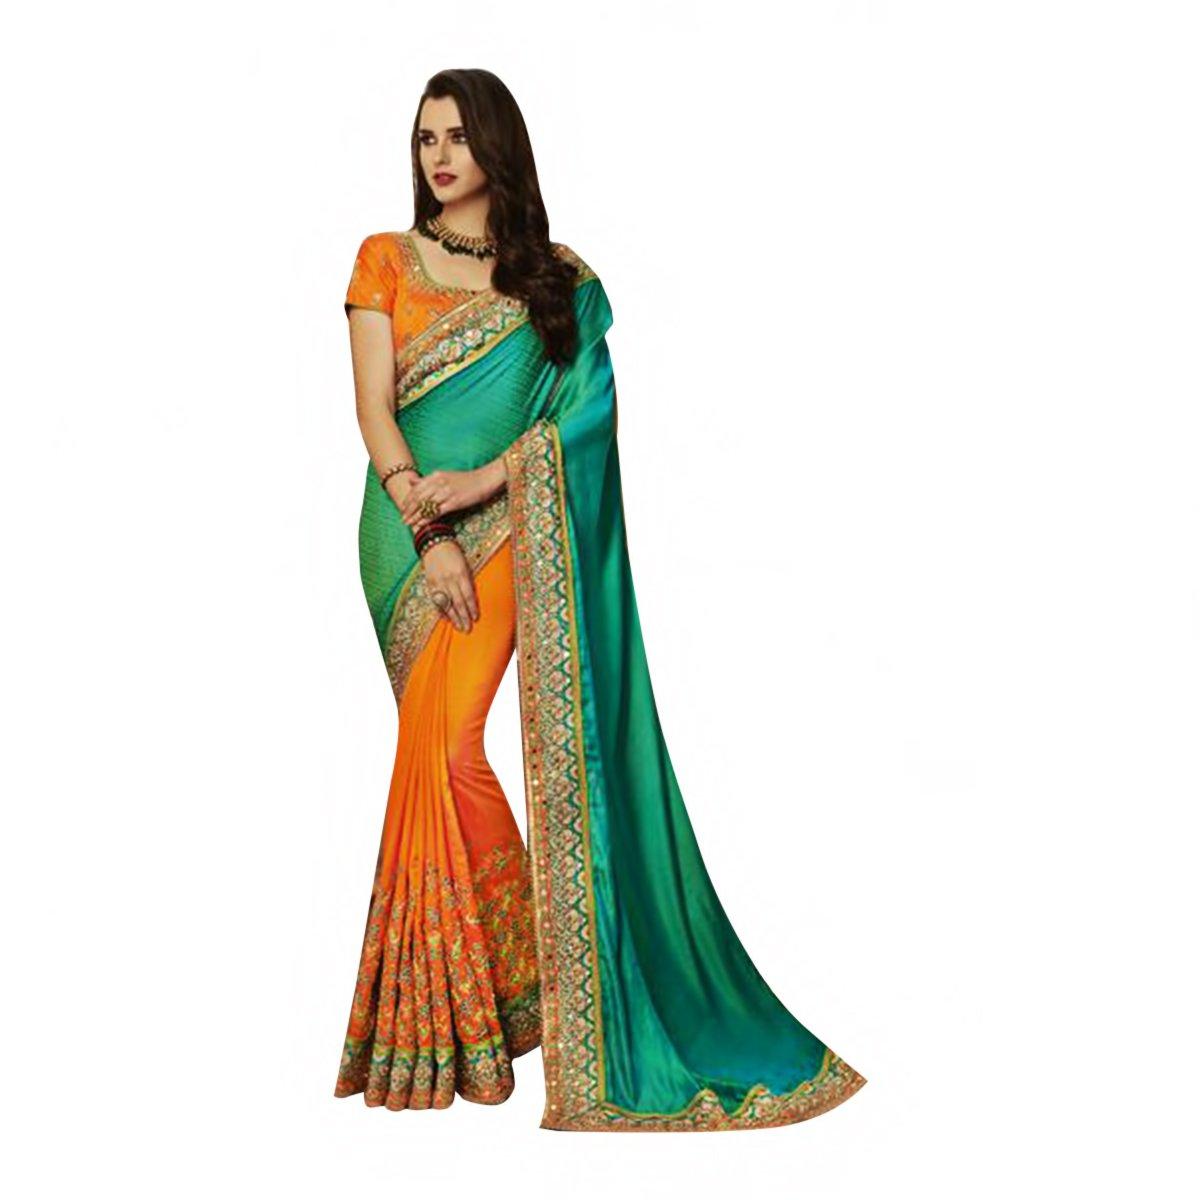 New Launch Bridal Silk Saree Sari Collection Blouse Wedding Party Wear Ceremony Women Muslim eid 586 15